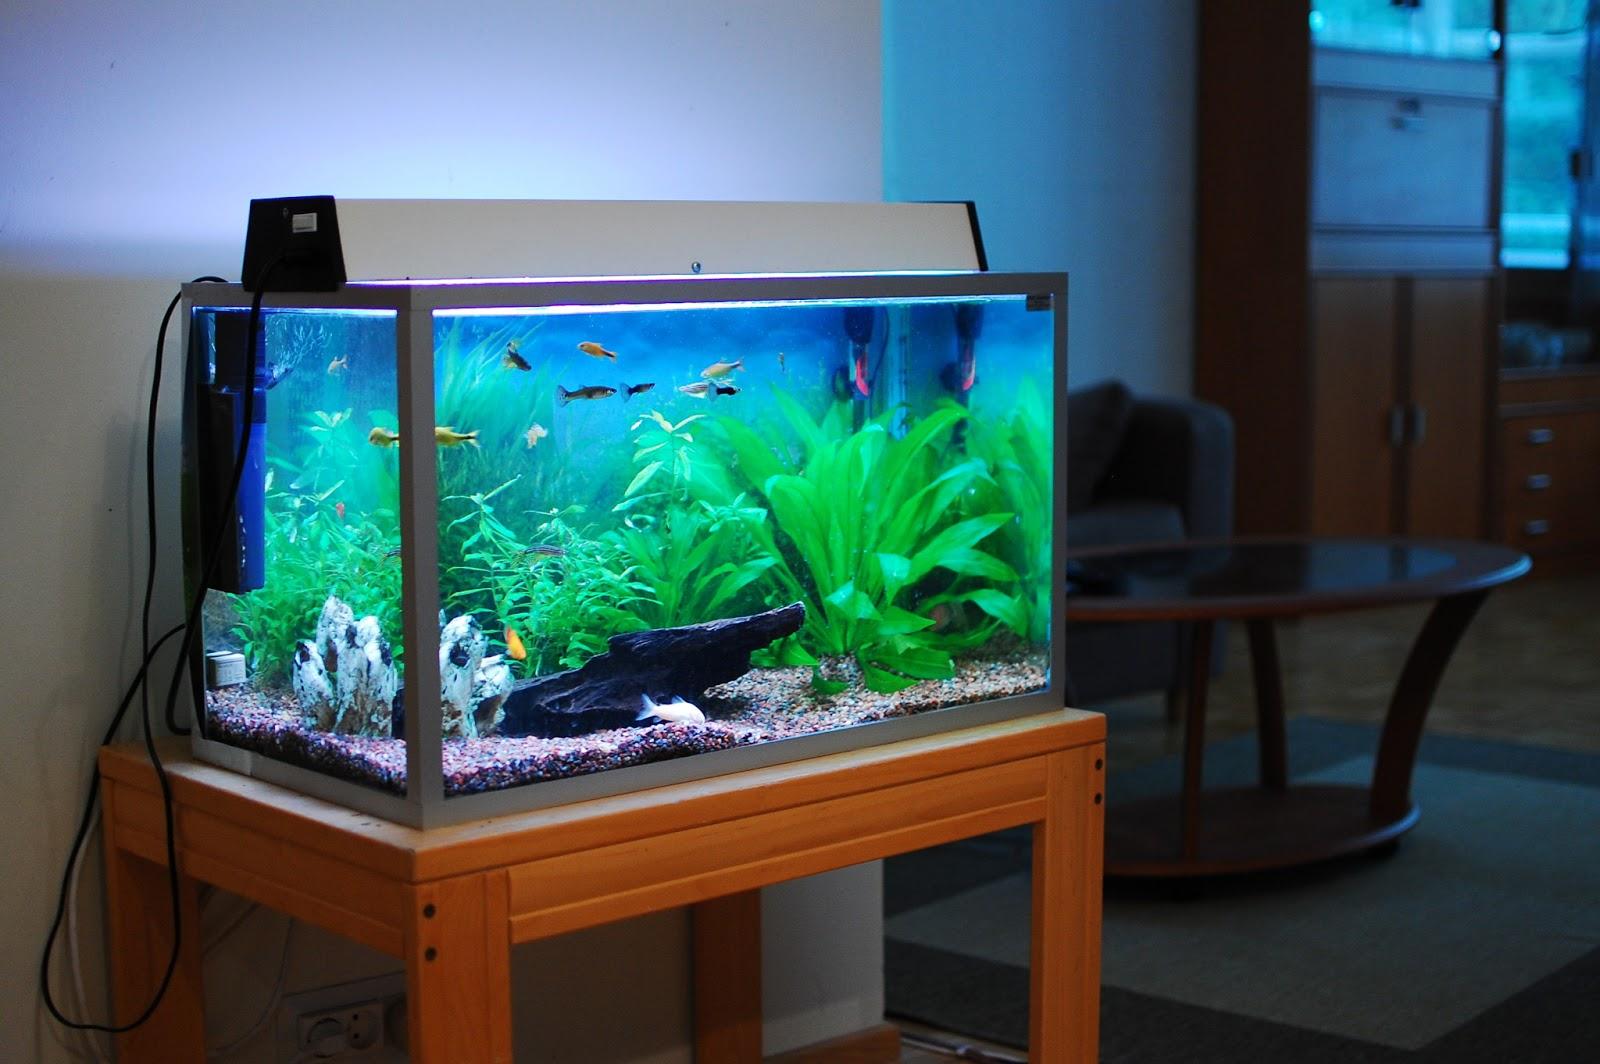 teknik membuat akuarium | informasi penyuluhan perikanan